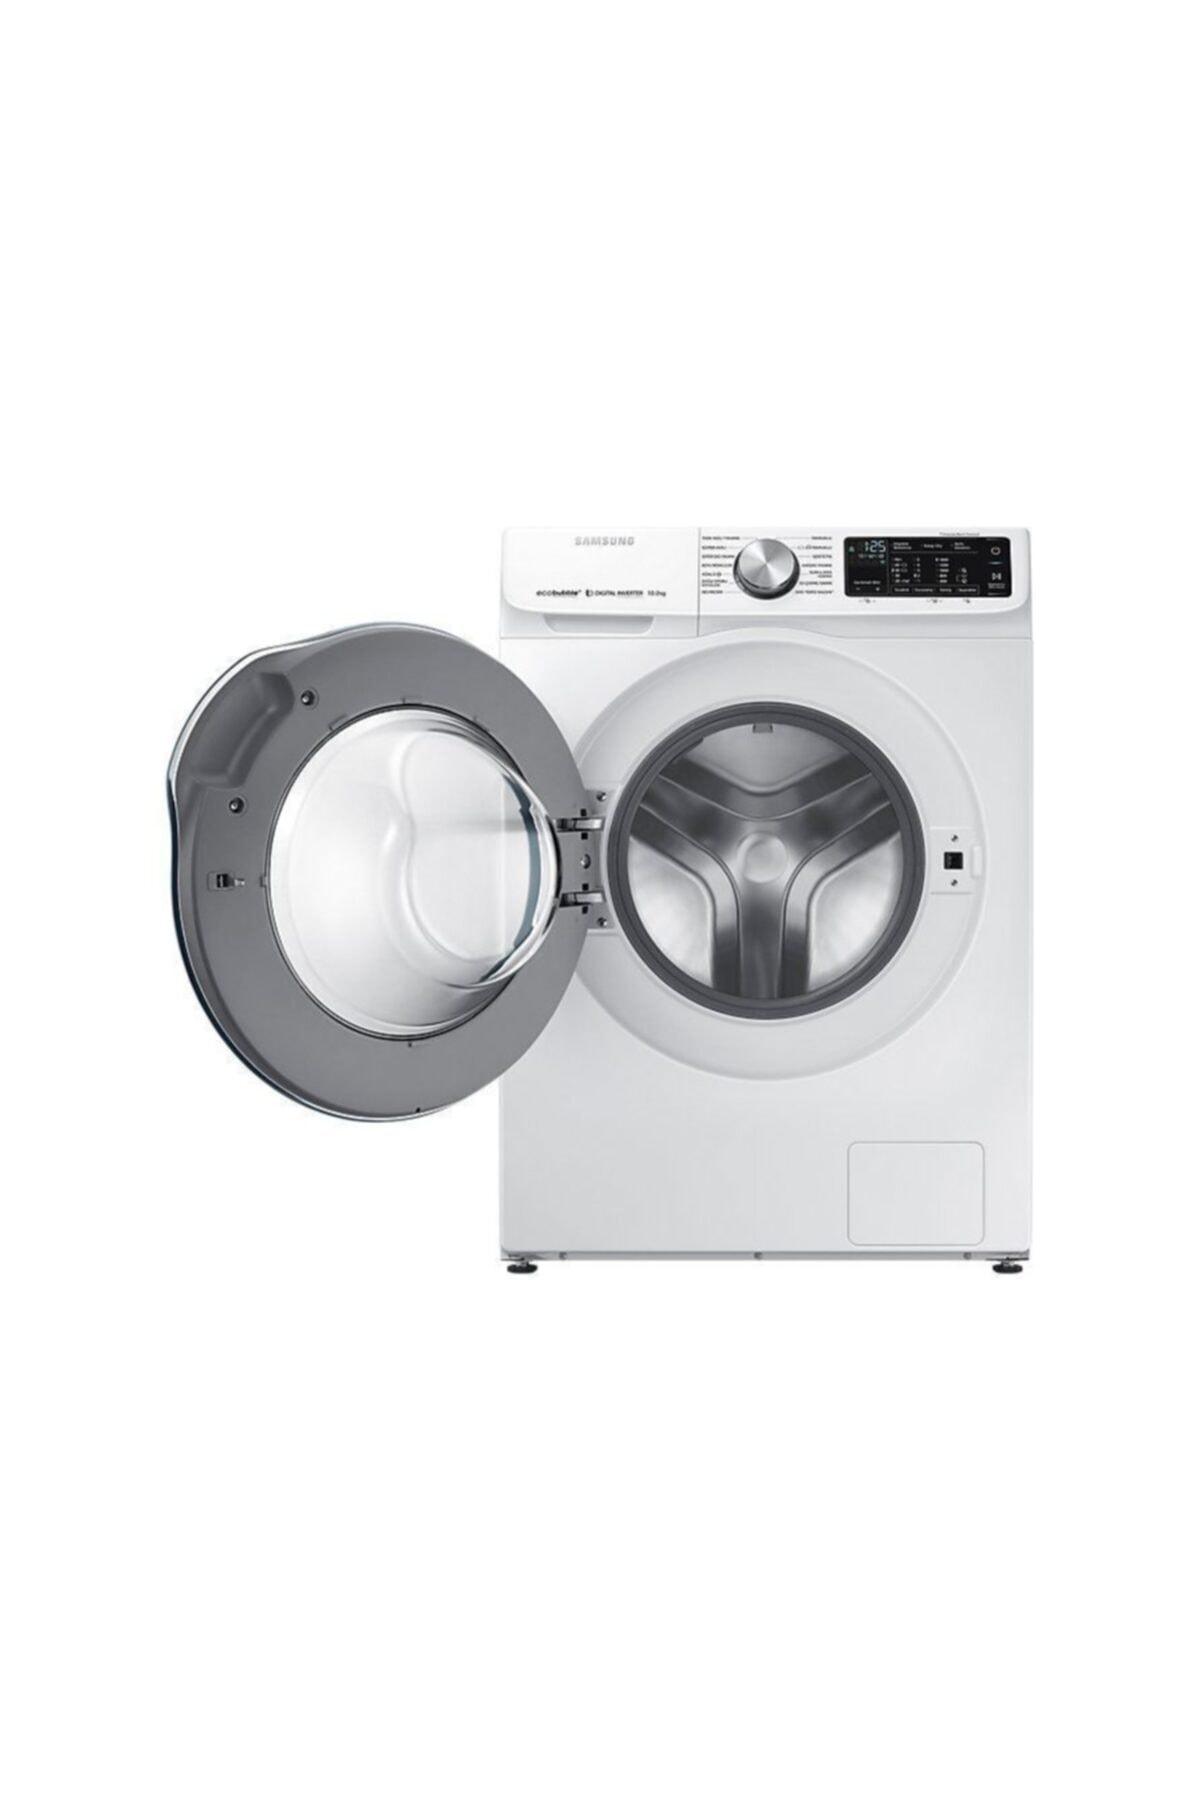 Samsung WW10N644RBW/AH A+++ 1400 Devir 10 kg Çamaşır Makinesi 2